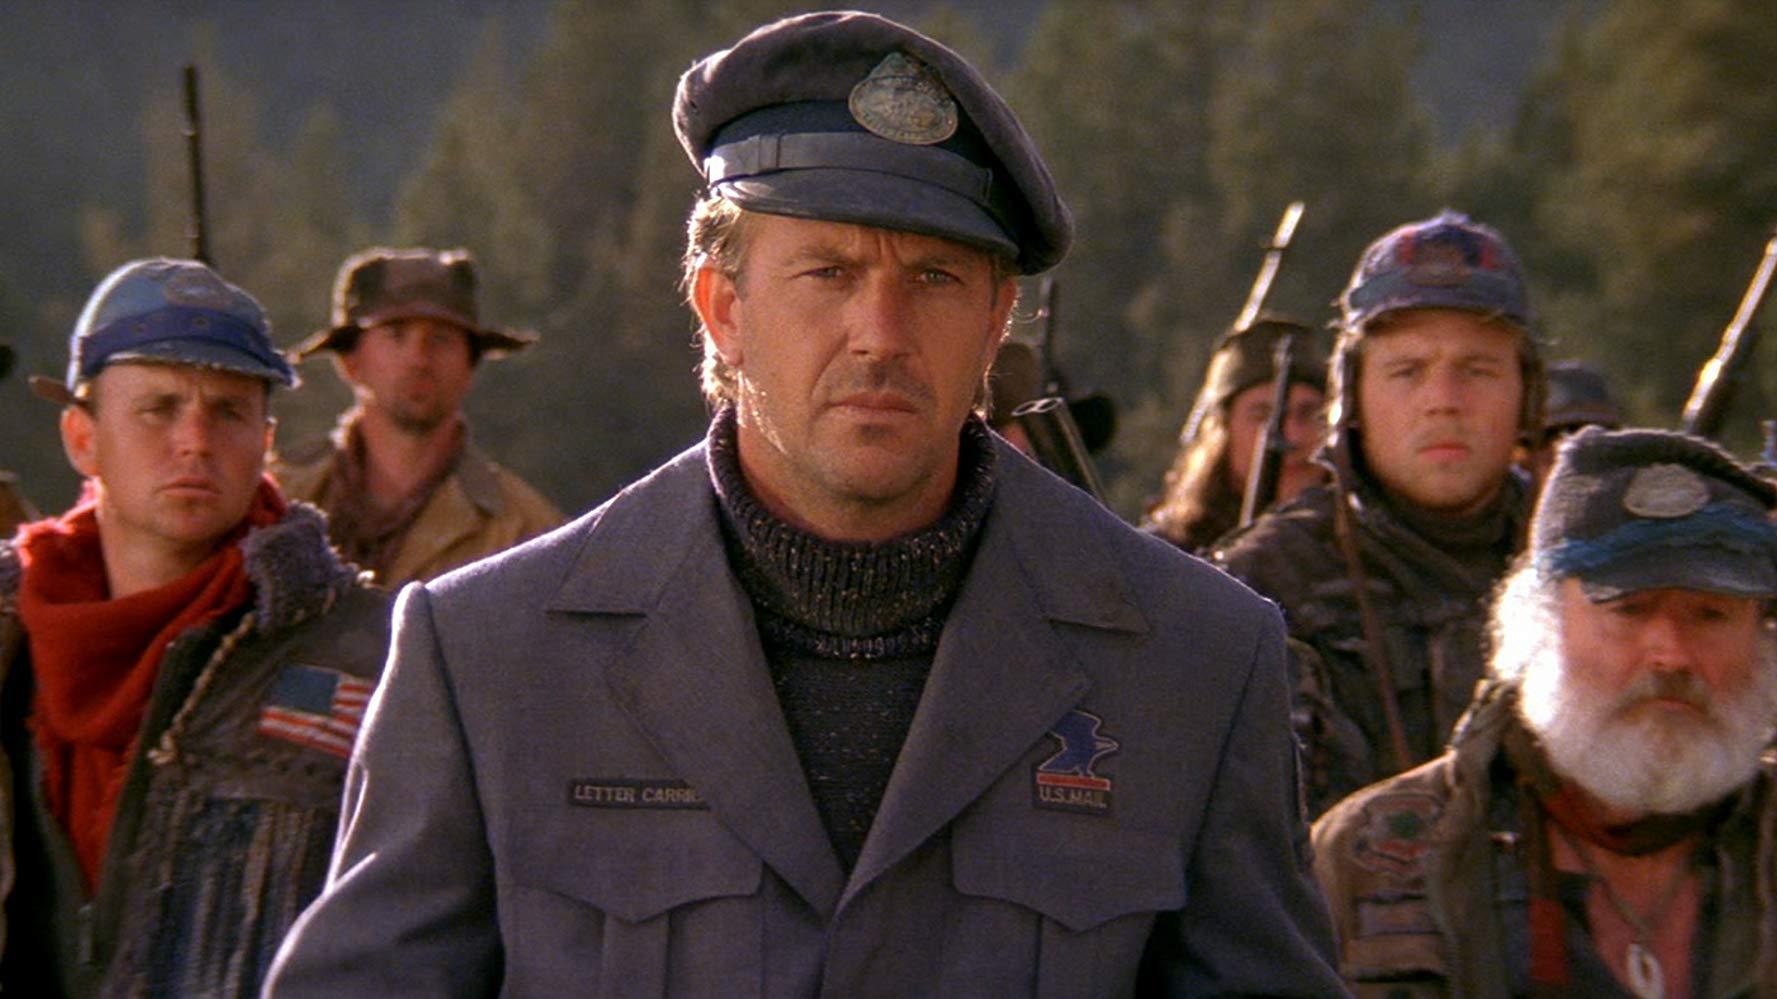 Kevin Costner as The Postman (1997)